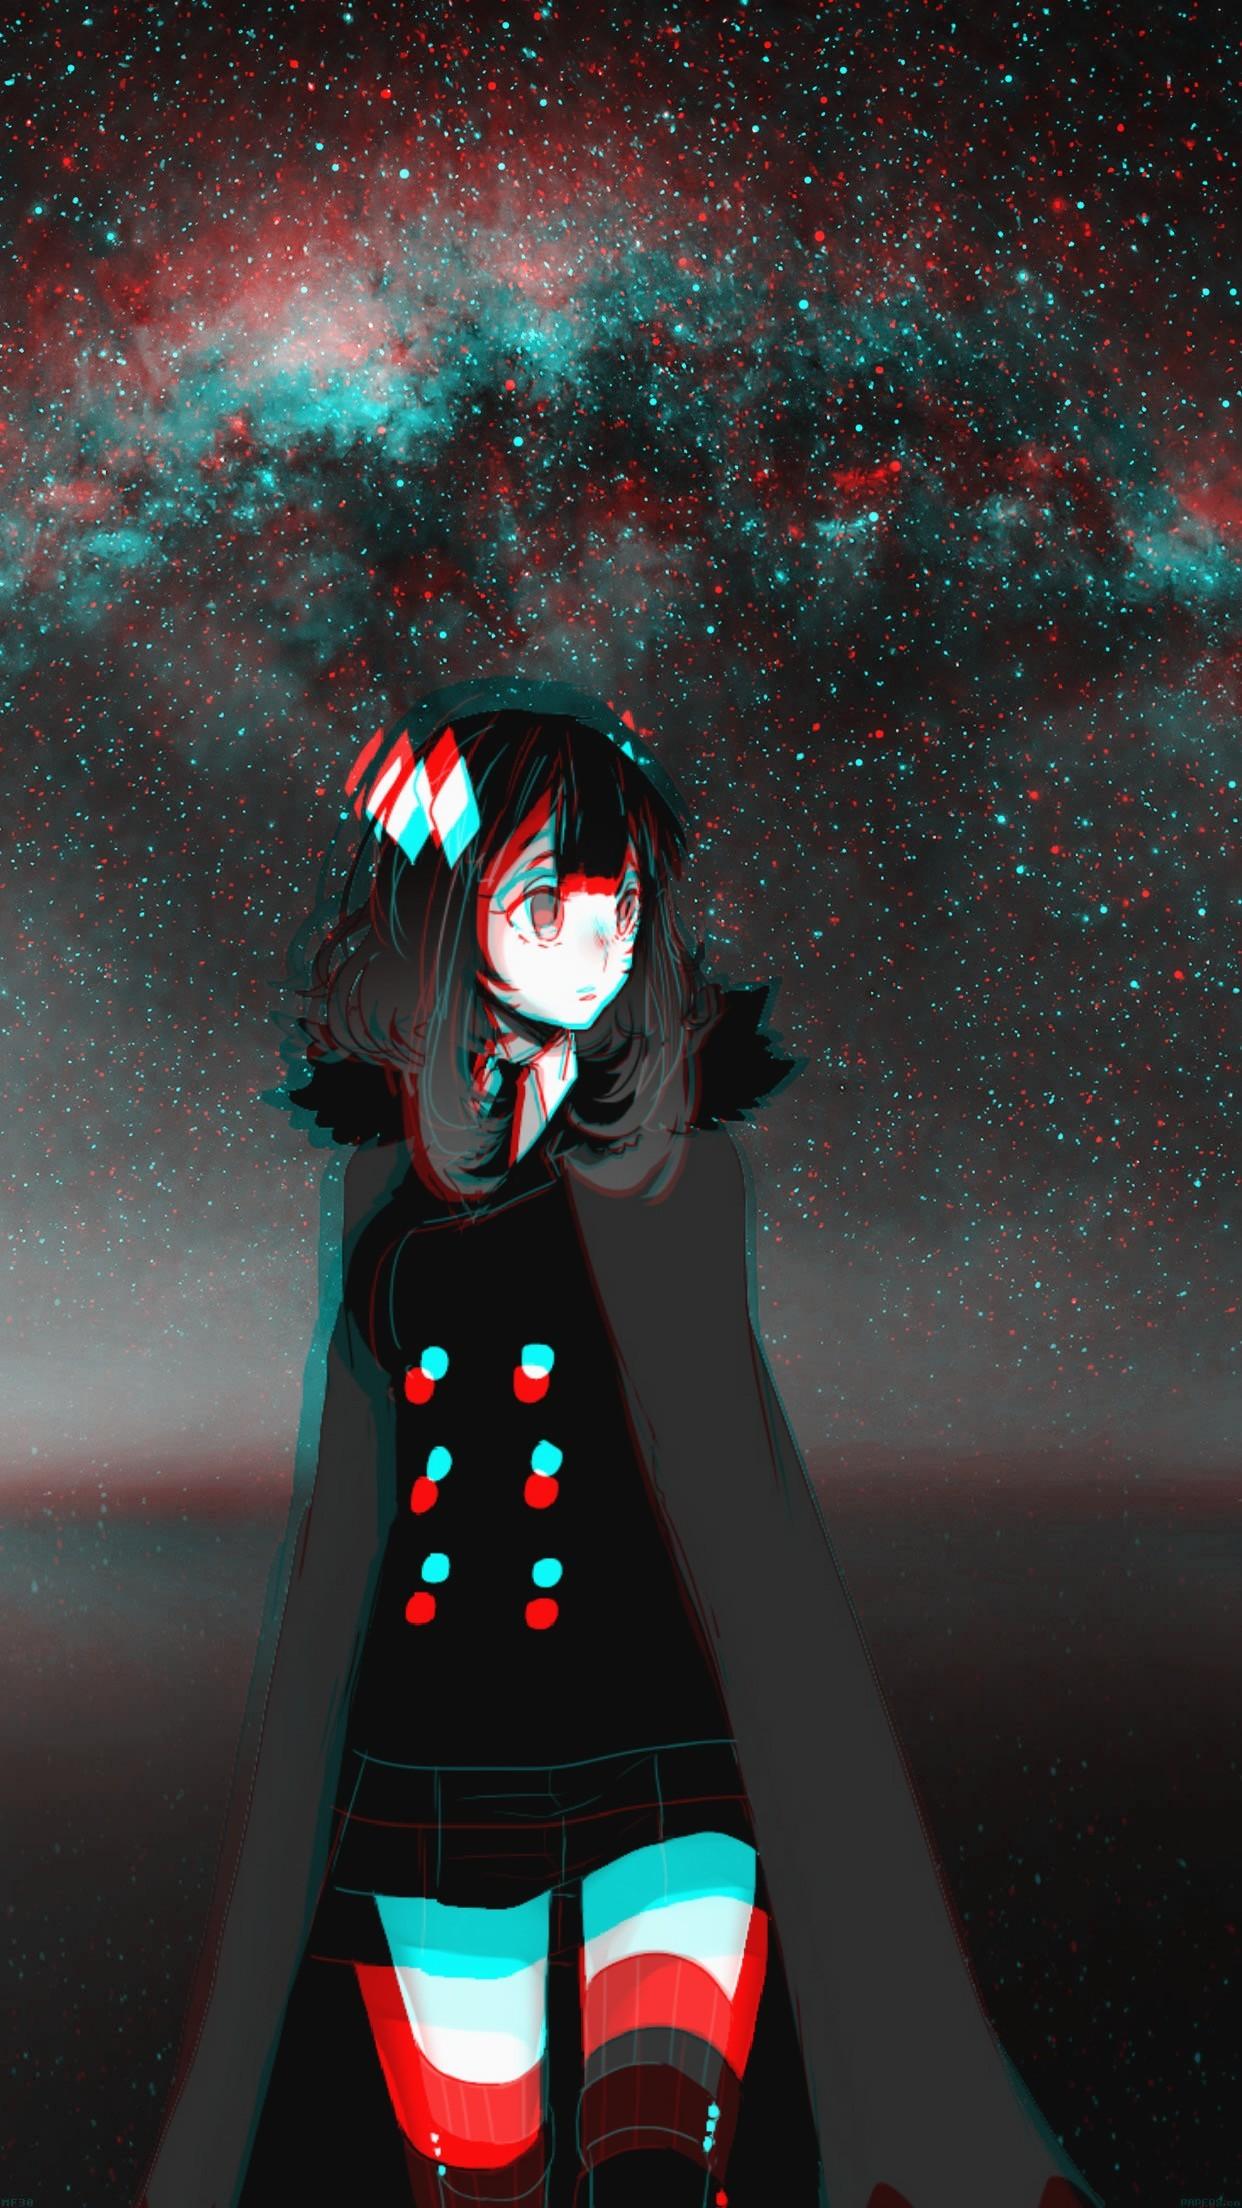 Best of Aesthetic Anime Girl Glitch - wallpaper